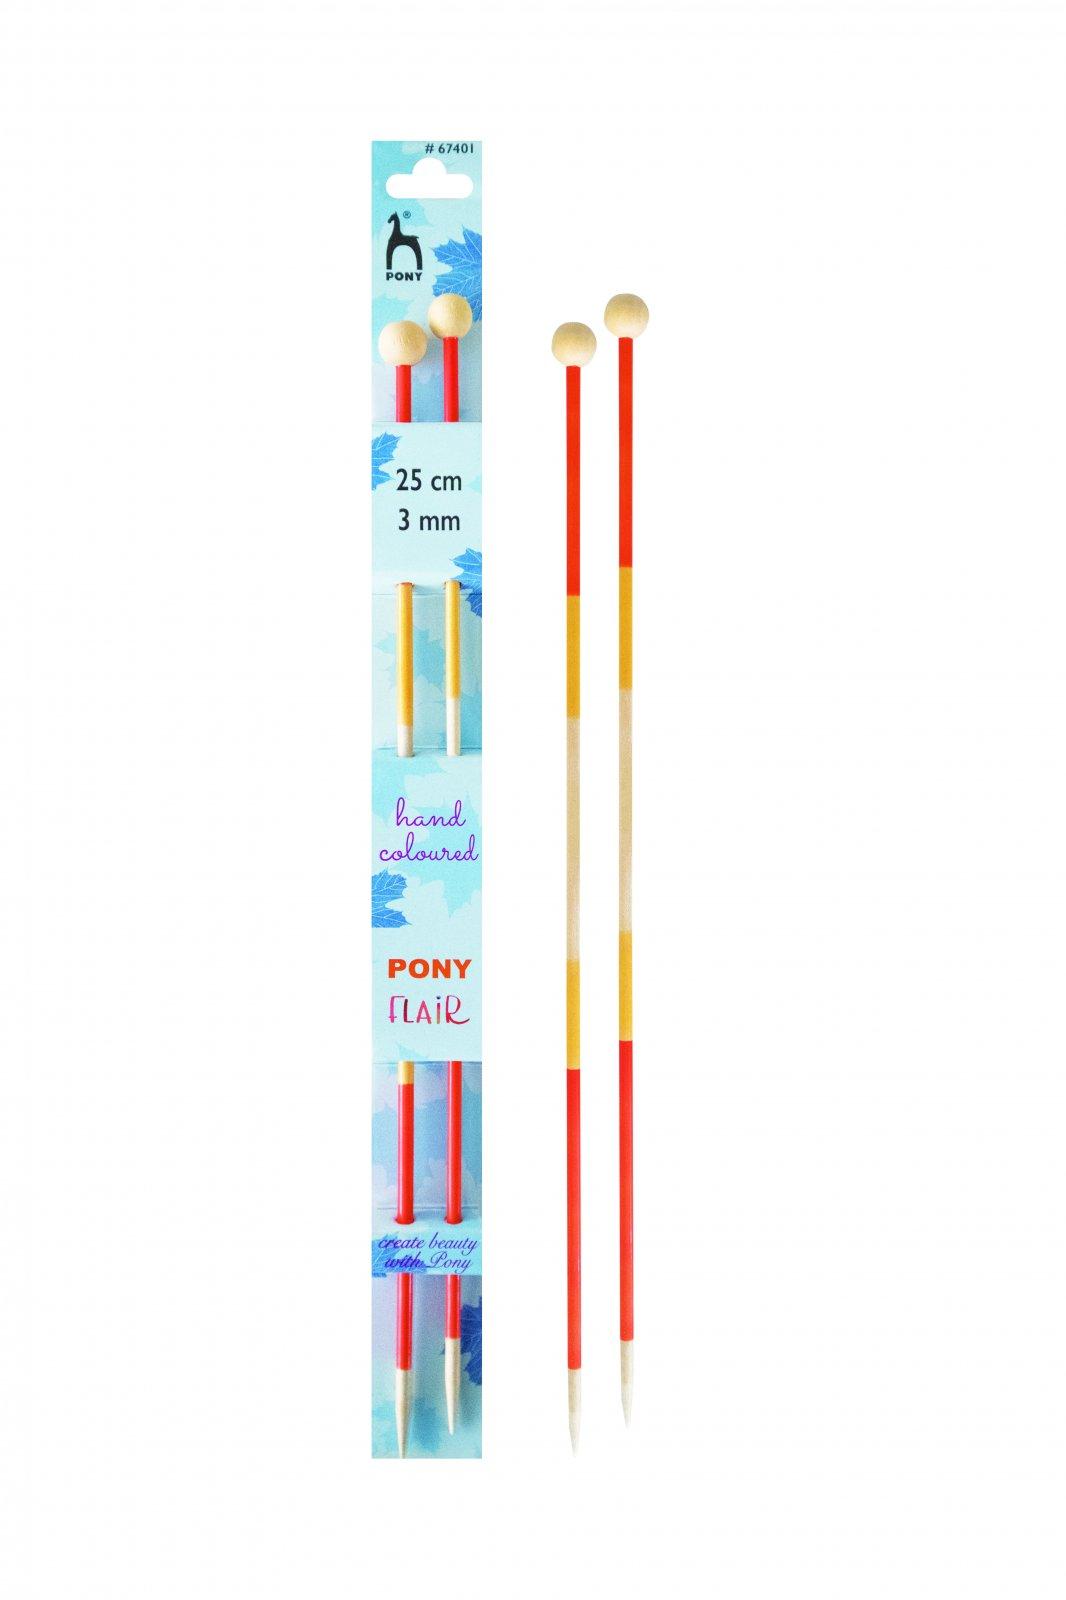 Pony - Flair Straight (Single Point) Knitting Needles